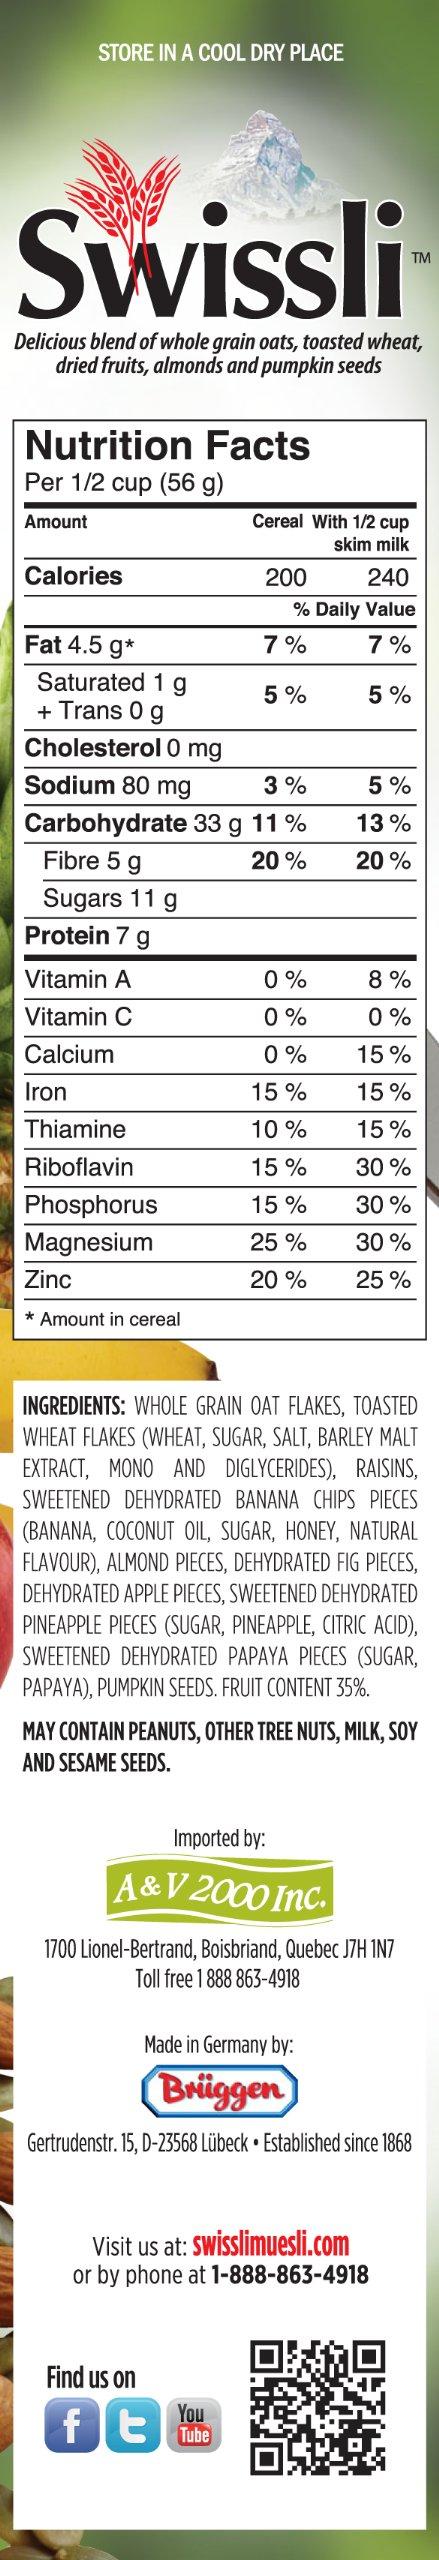 Swissli Muesli 35% Fruit & Nuts - 1kg/35 Ounce Boxes - 2 Pack - NON GMO